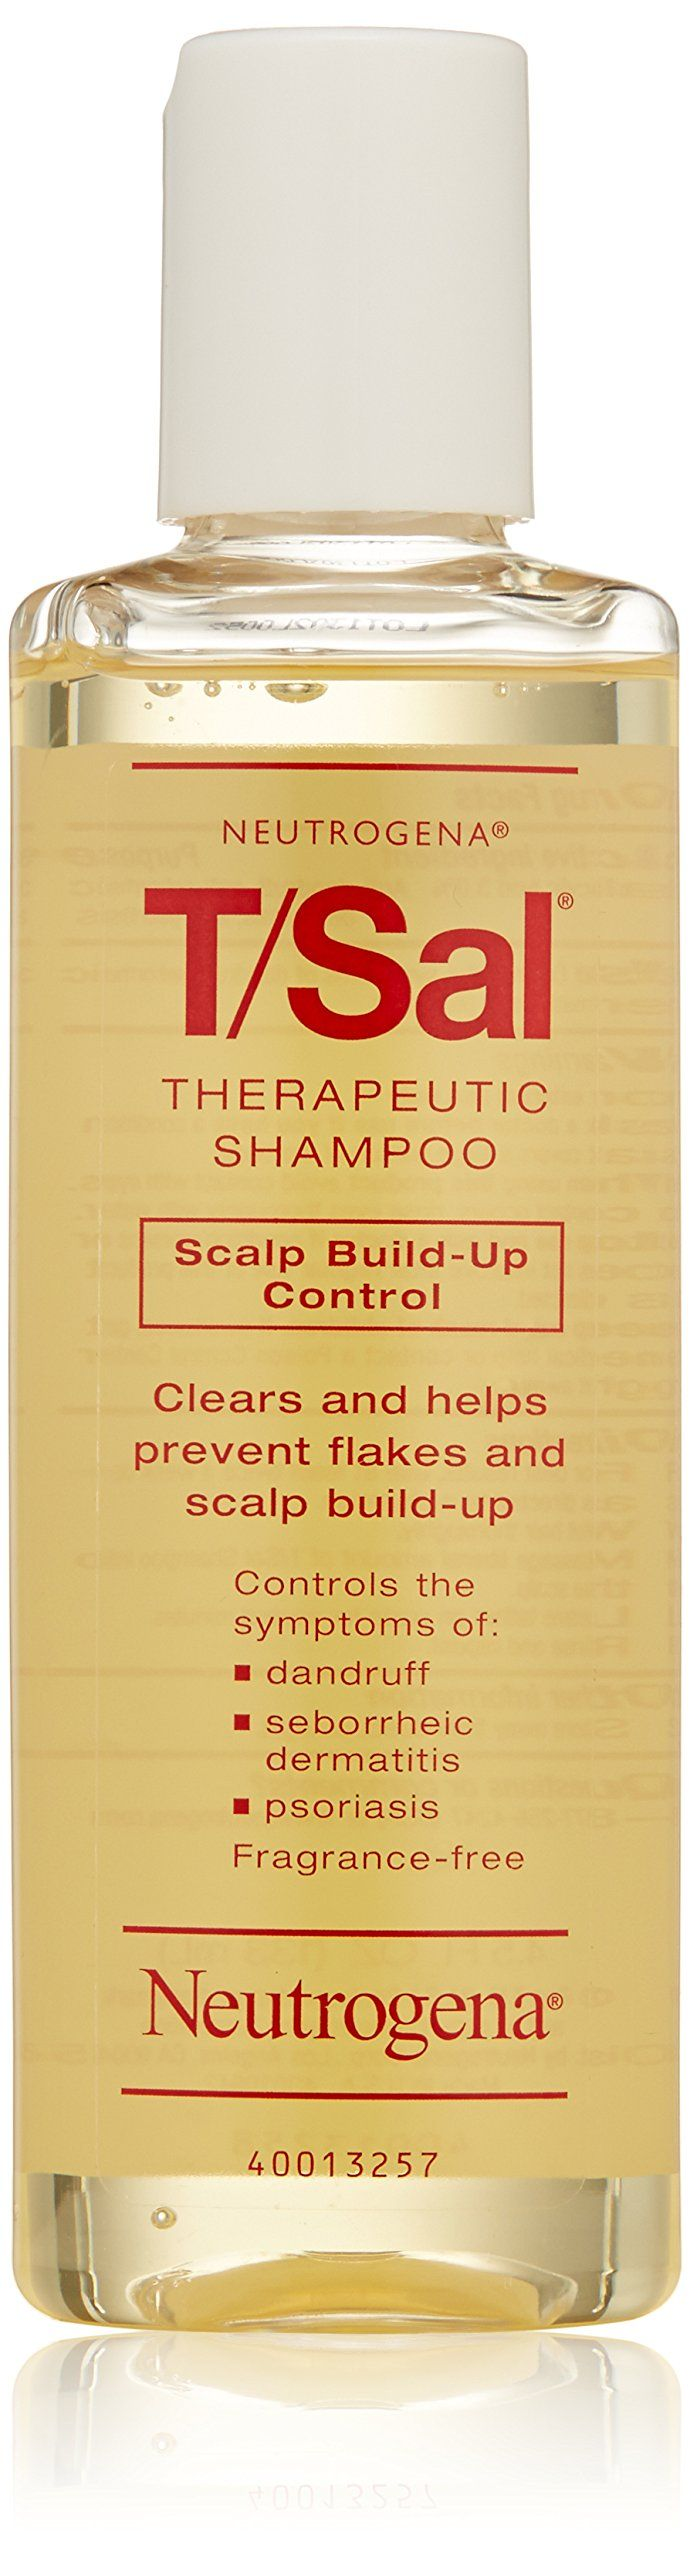 Neutrogena T/Sal Shampoo Scalp Build-Up Control, 4.5 Fl oz.